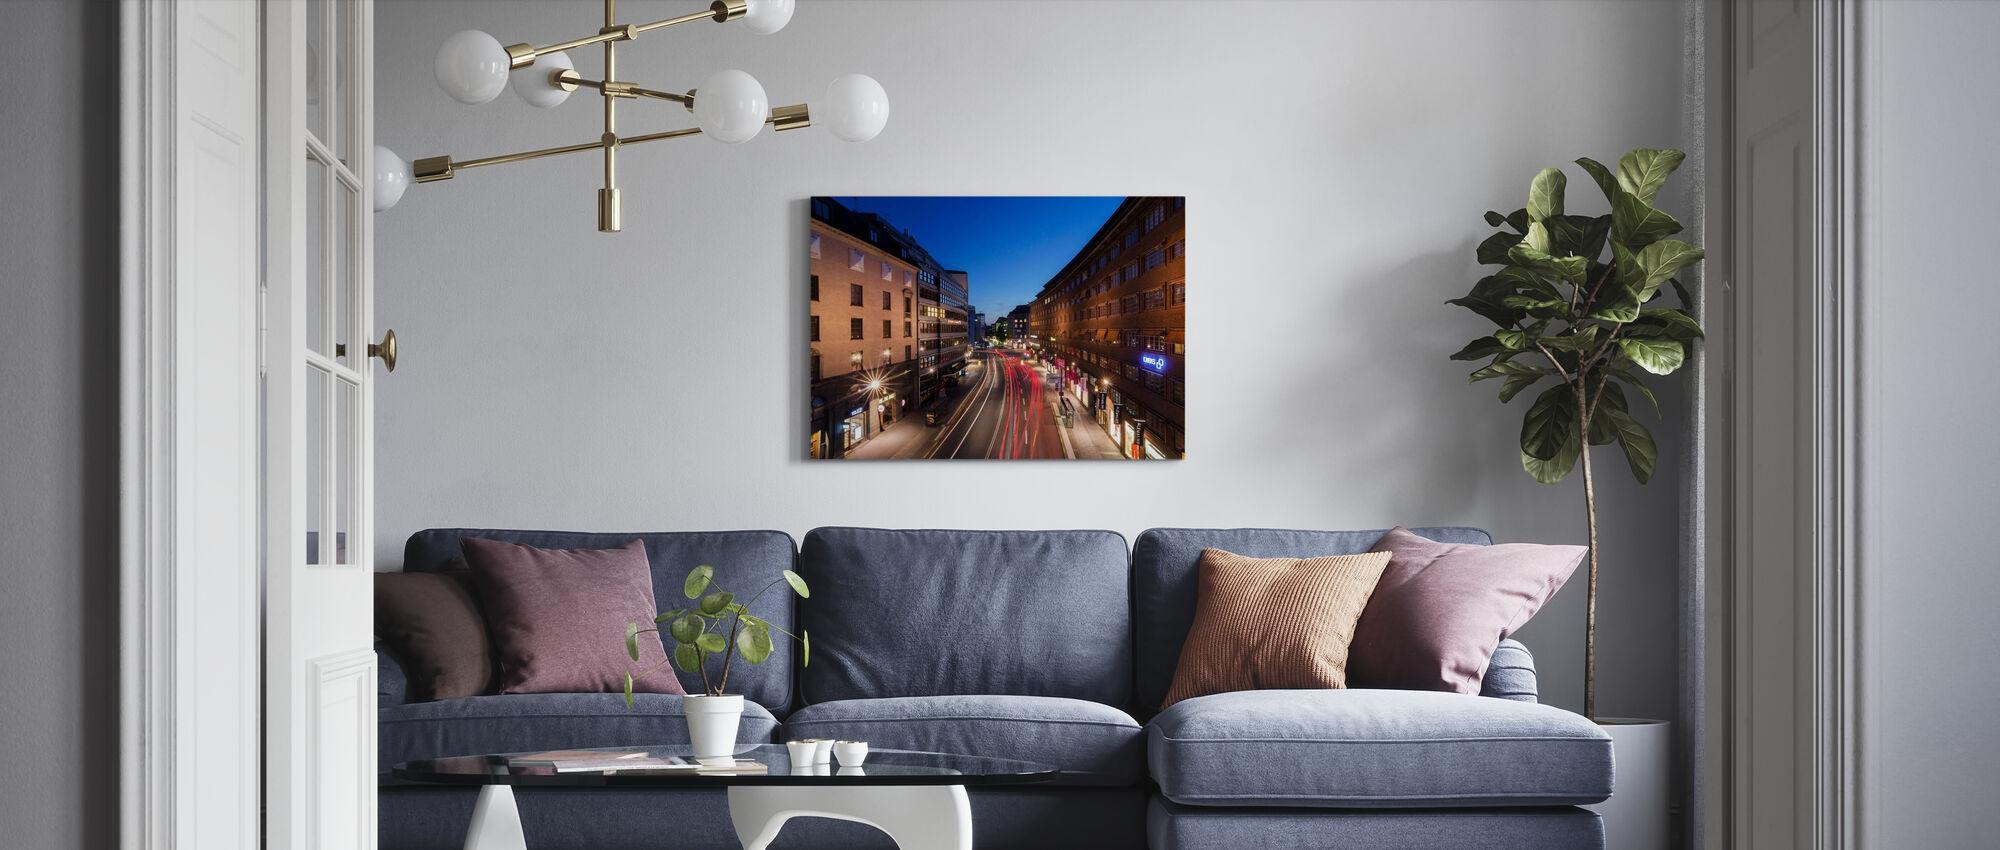 Striature di luce a Kungsgatan - Stampa su tela - Salotto